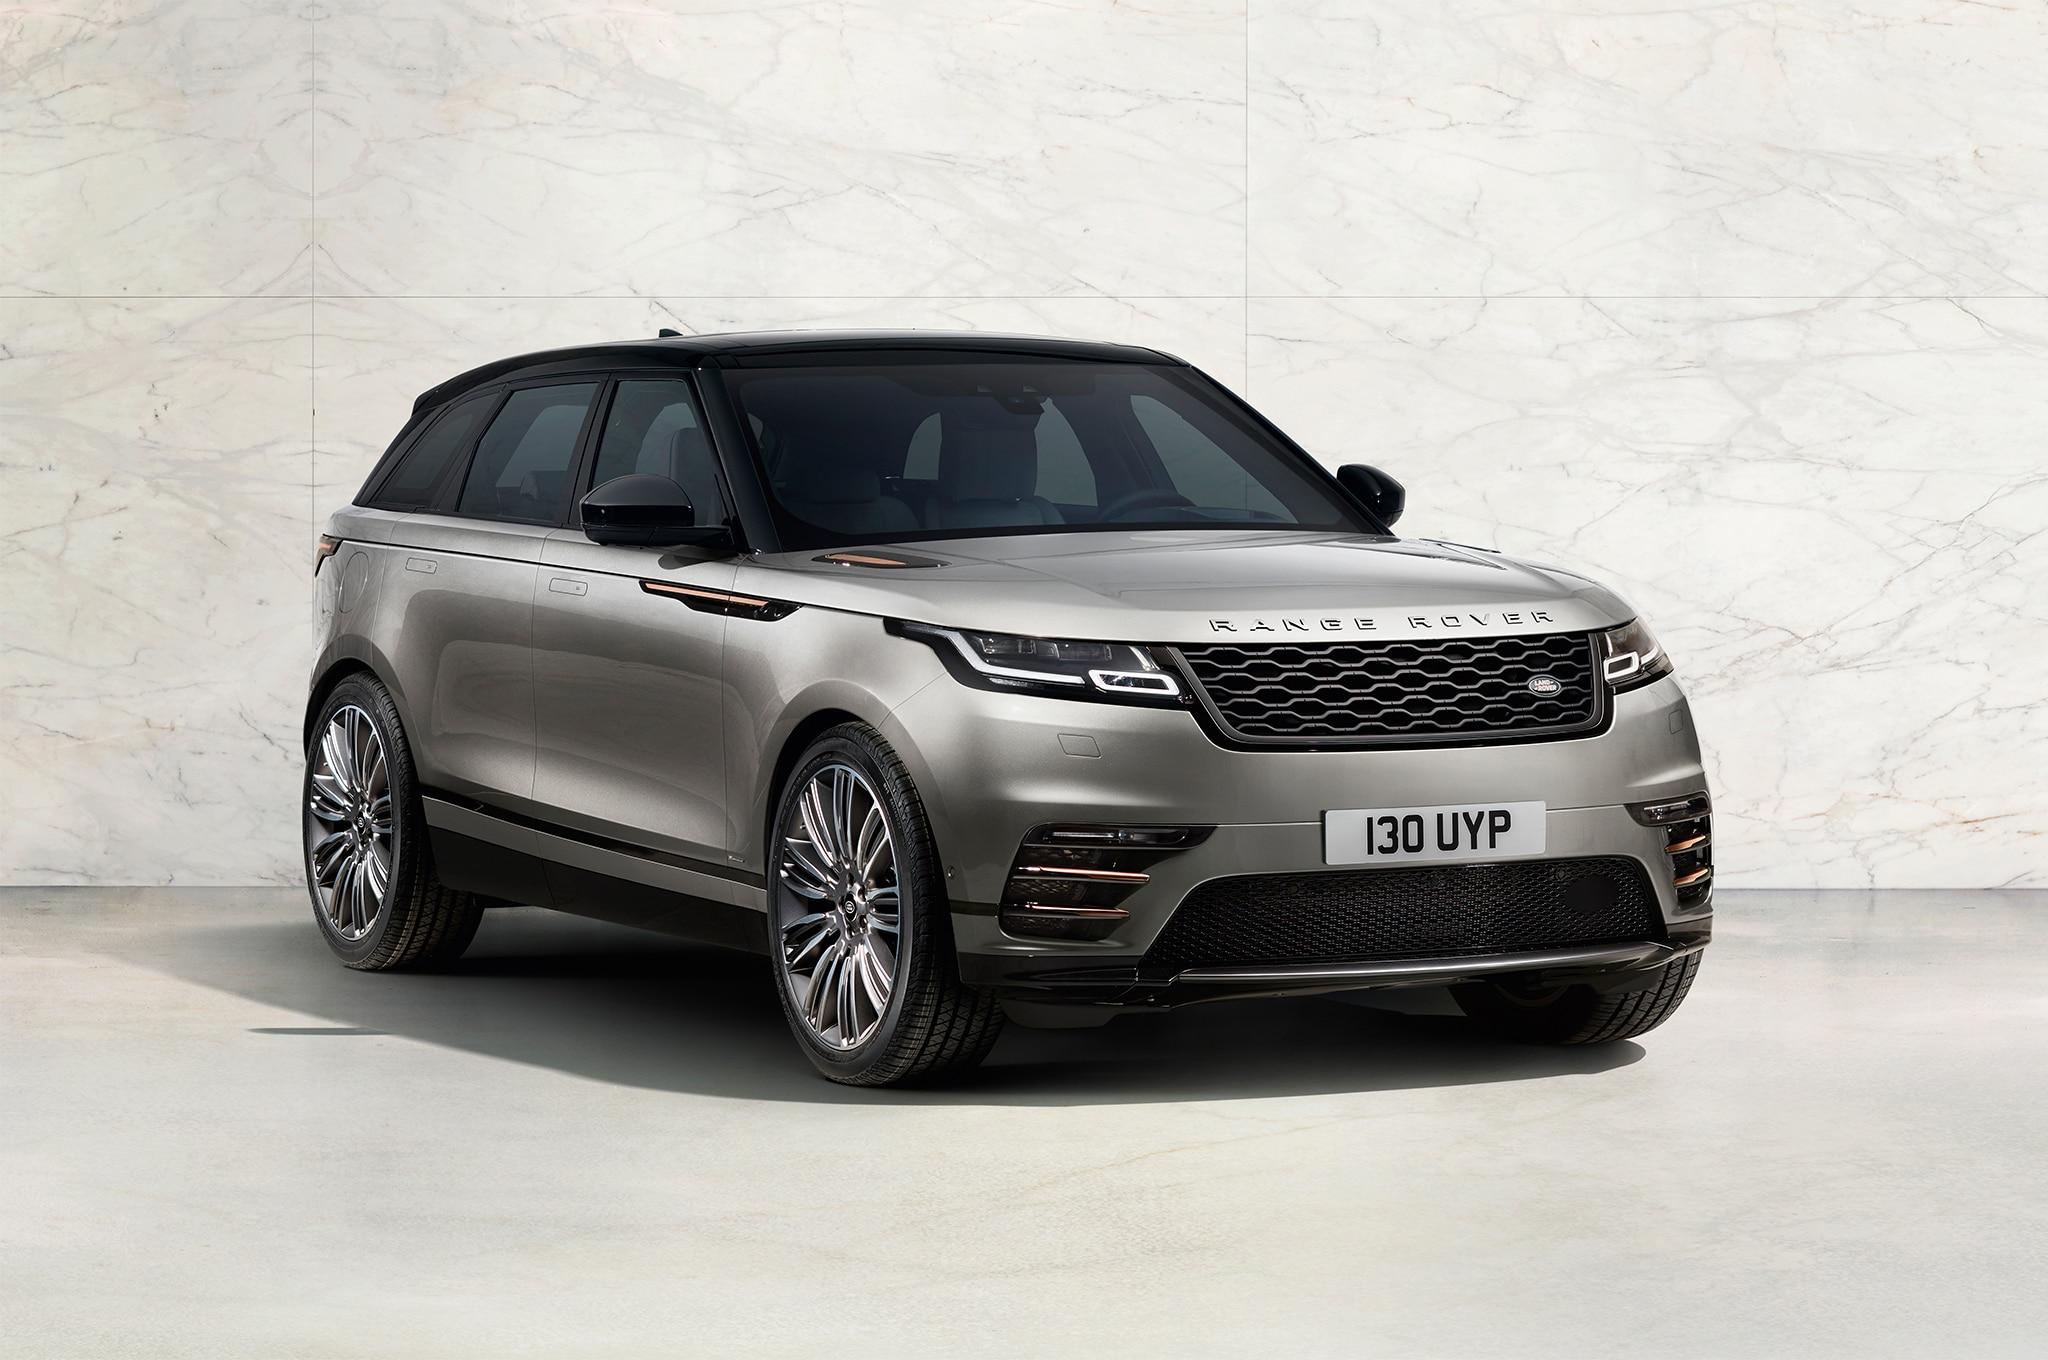 e Week With 2018 Land Rover Range Rover Velar S